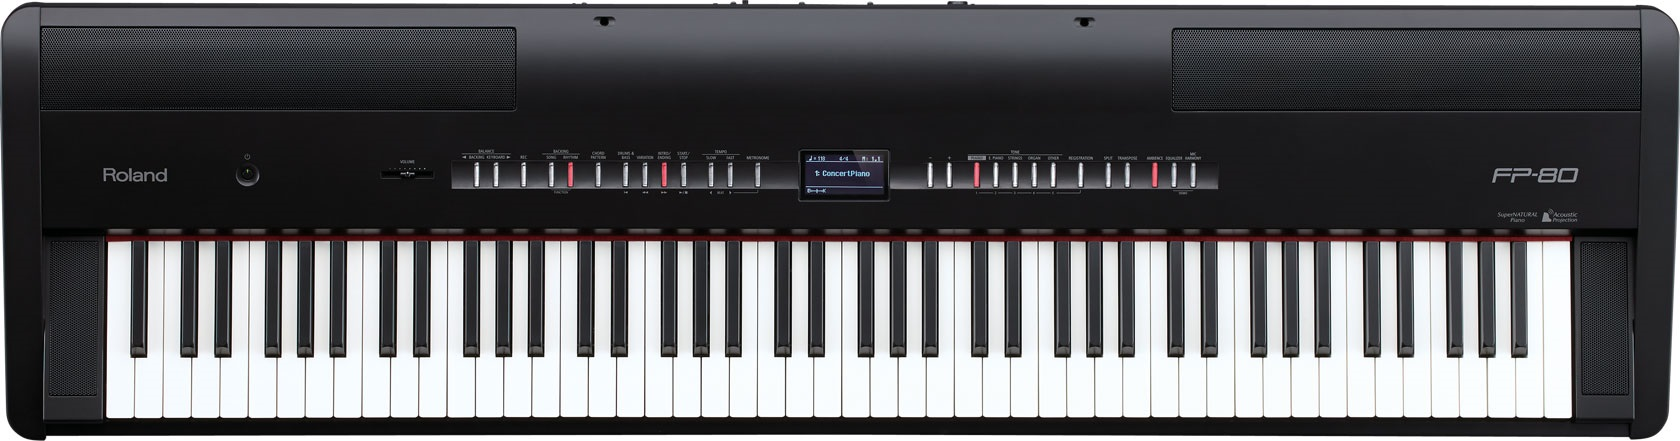 Roland FP-80 BK